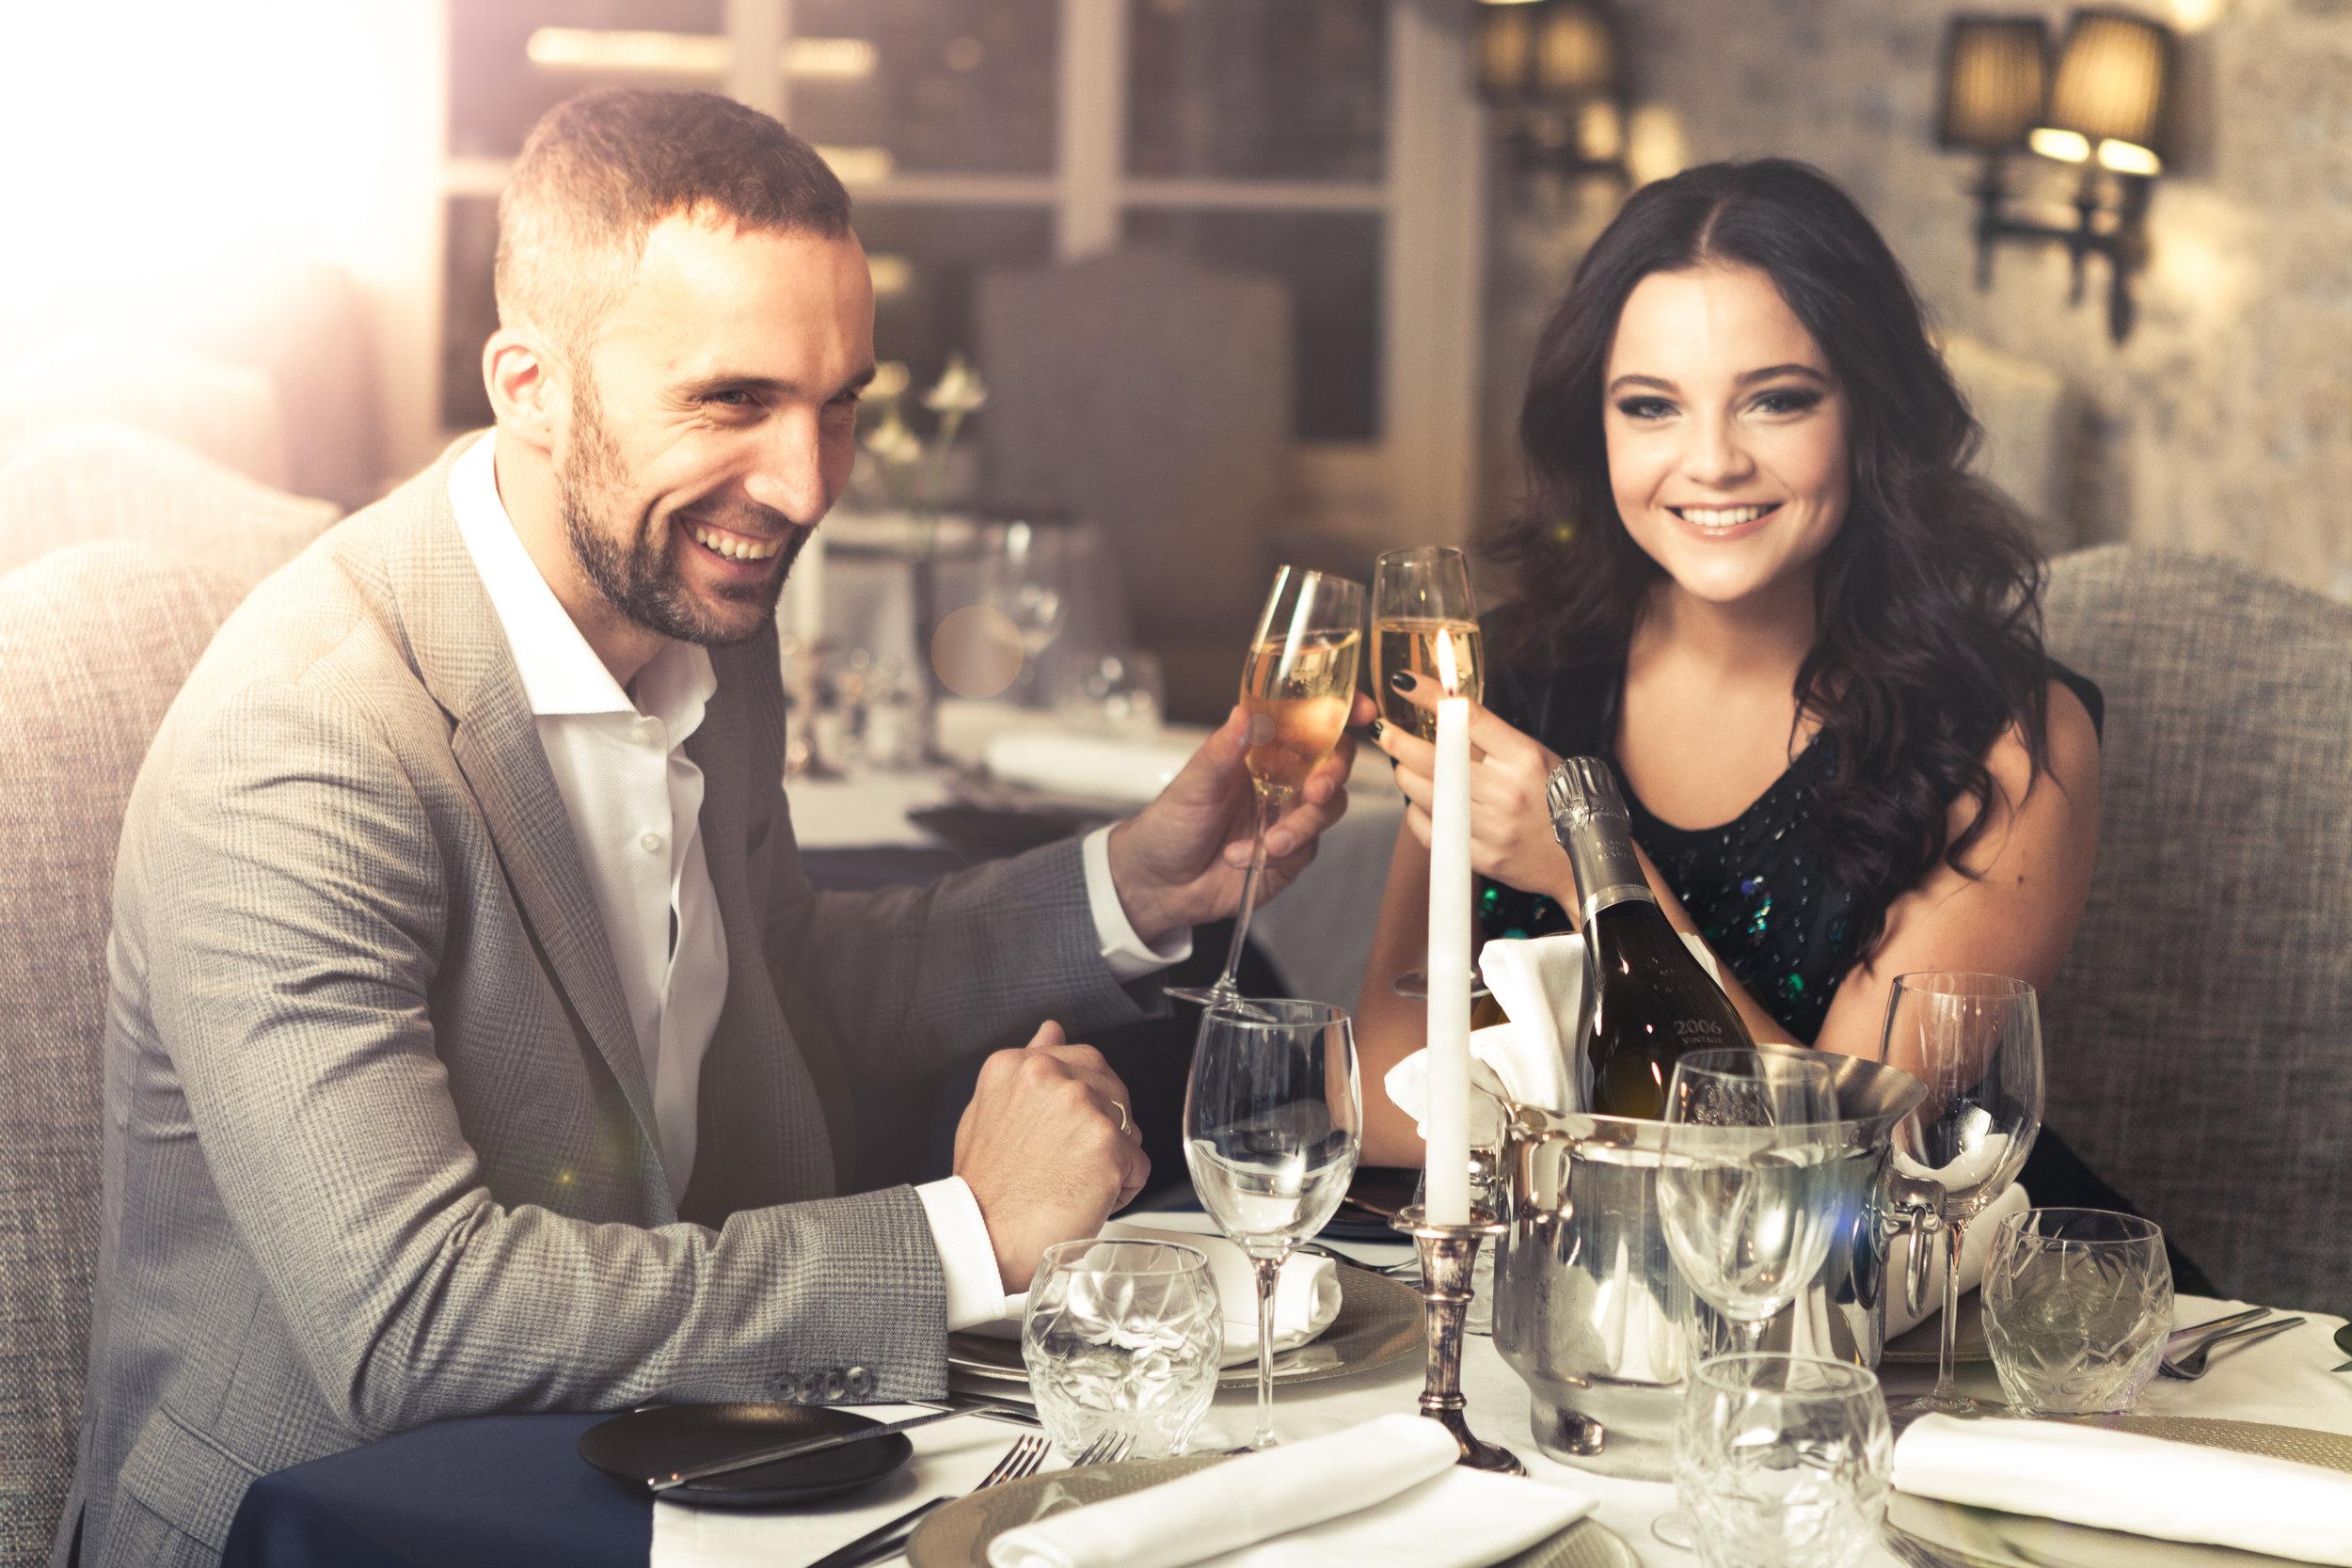 Champagne Toast Date.jpeg